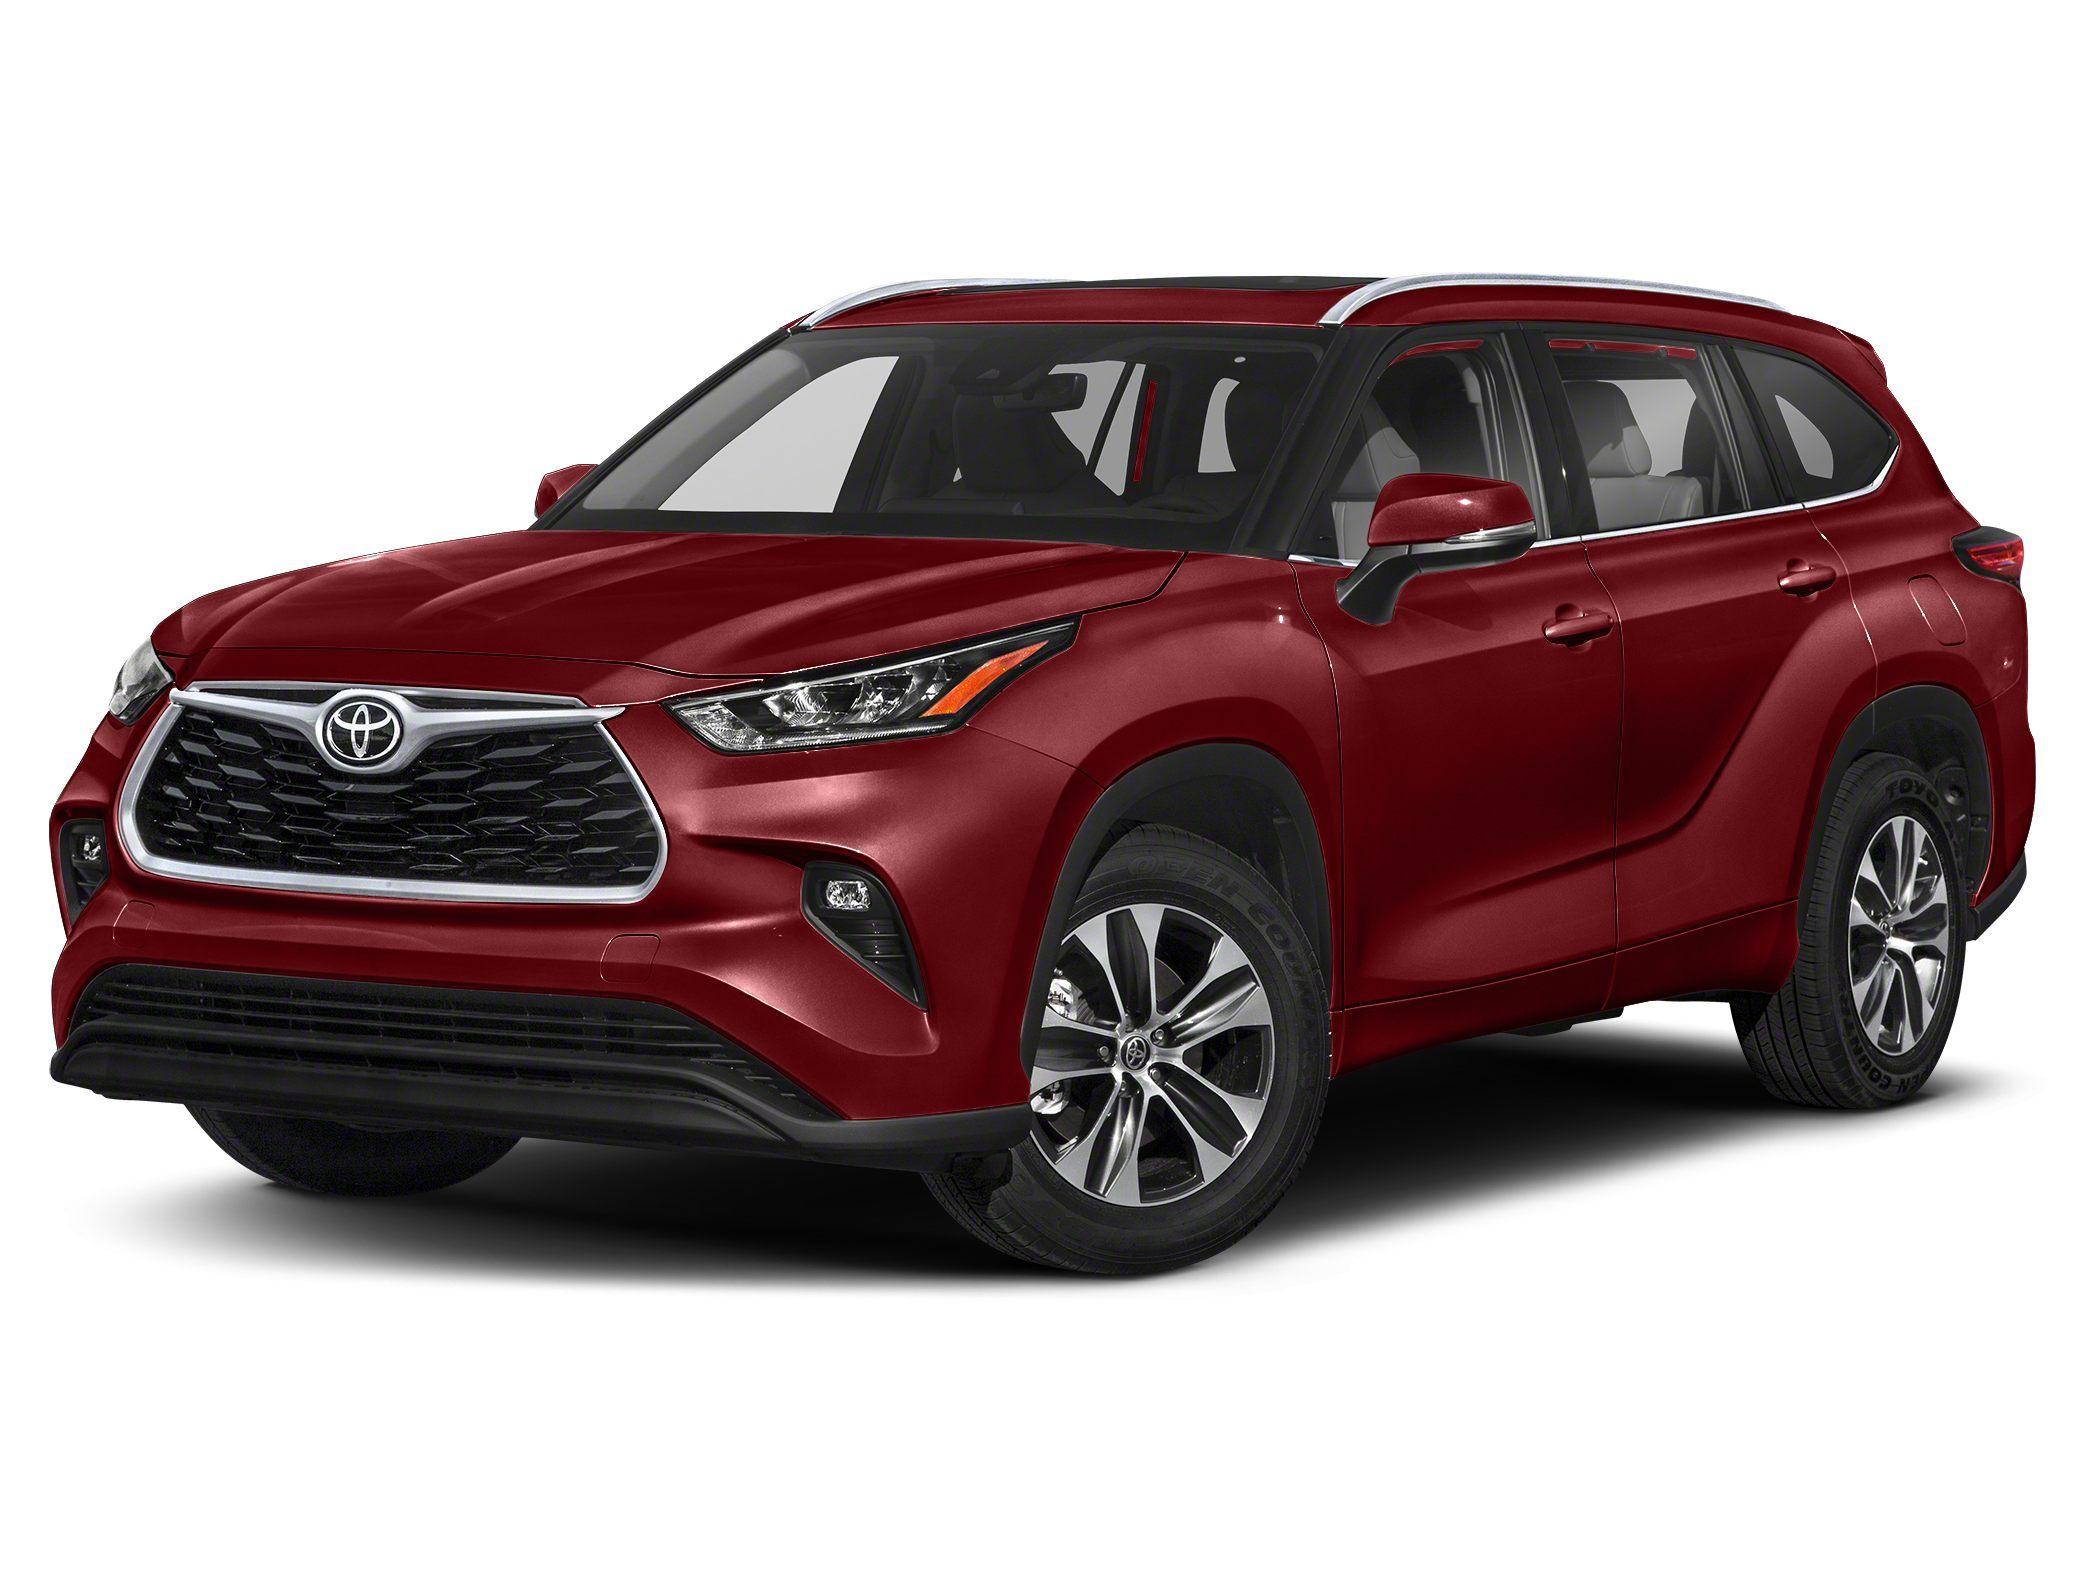 2022 Toyota Highlander SUV